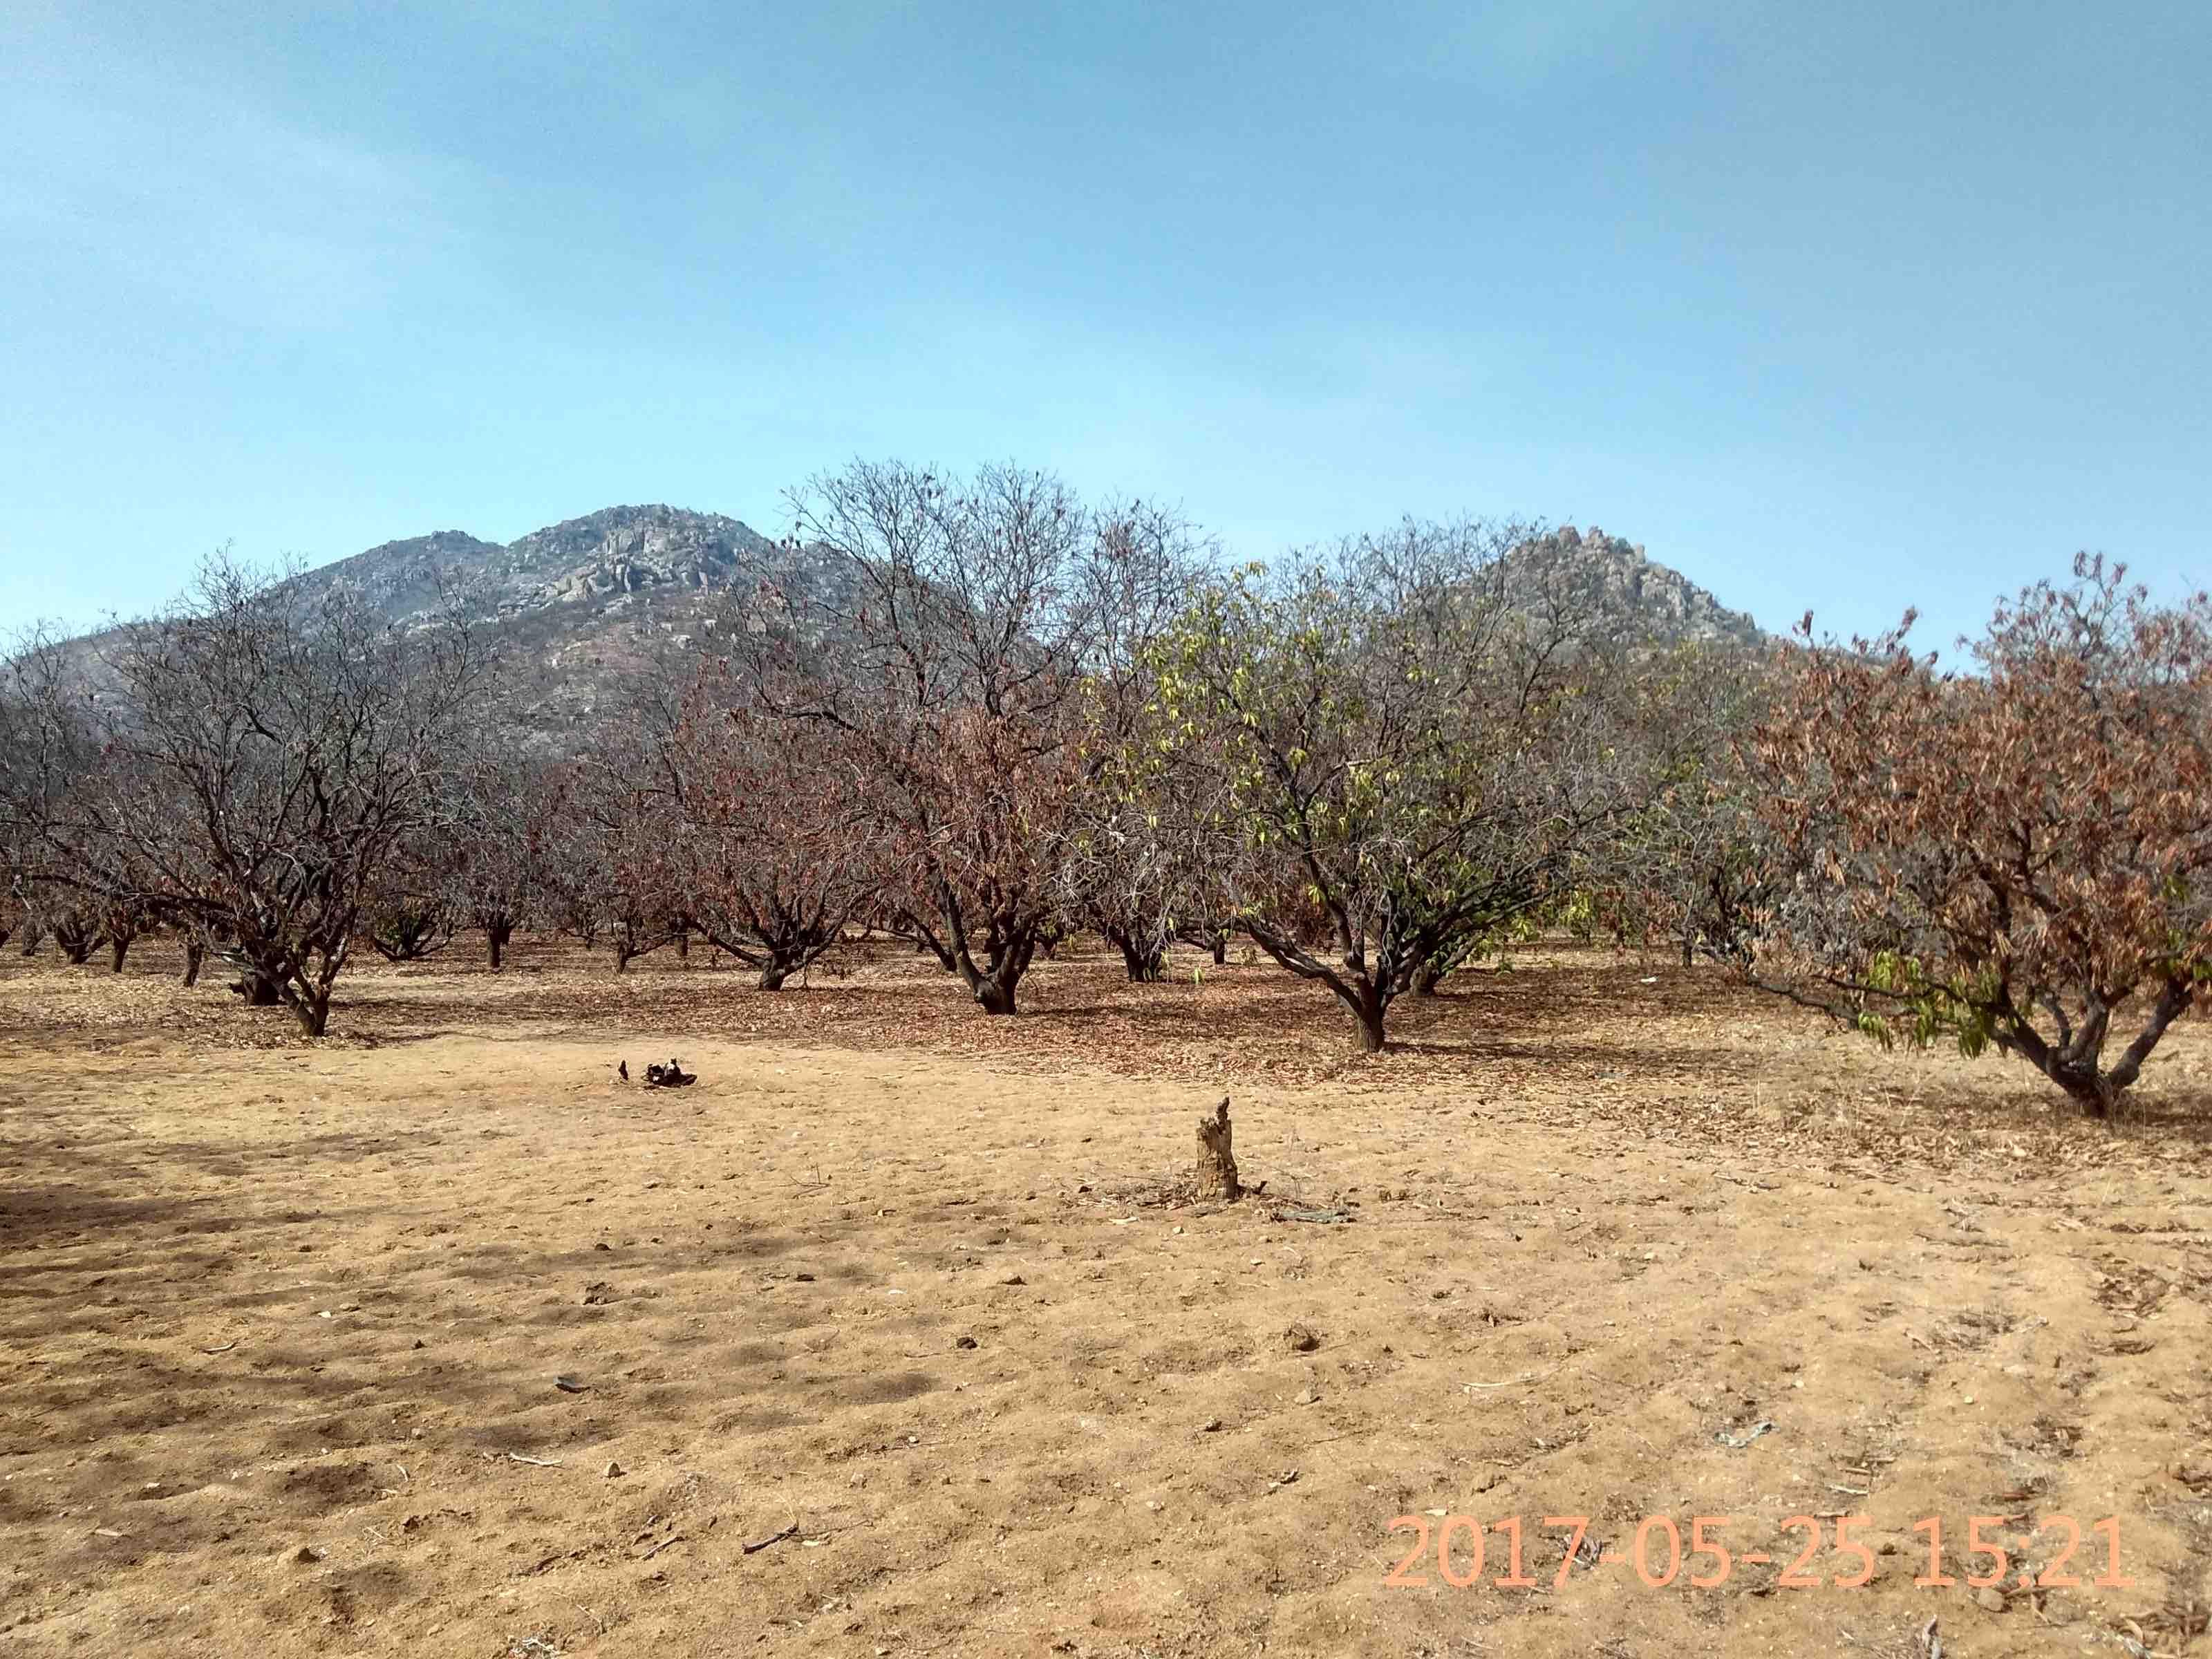 Dead mango trees in the fields of Chinni Krishnaiah and Janardhan in Bucchayyavaripalle, in Bhukkapatnam mandal of Anantapur district. Credit: Rahul Maganti